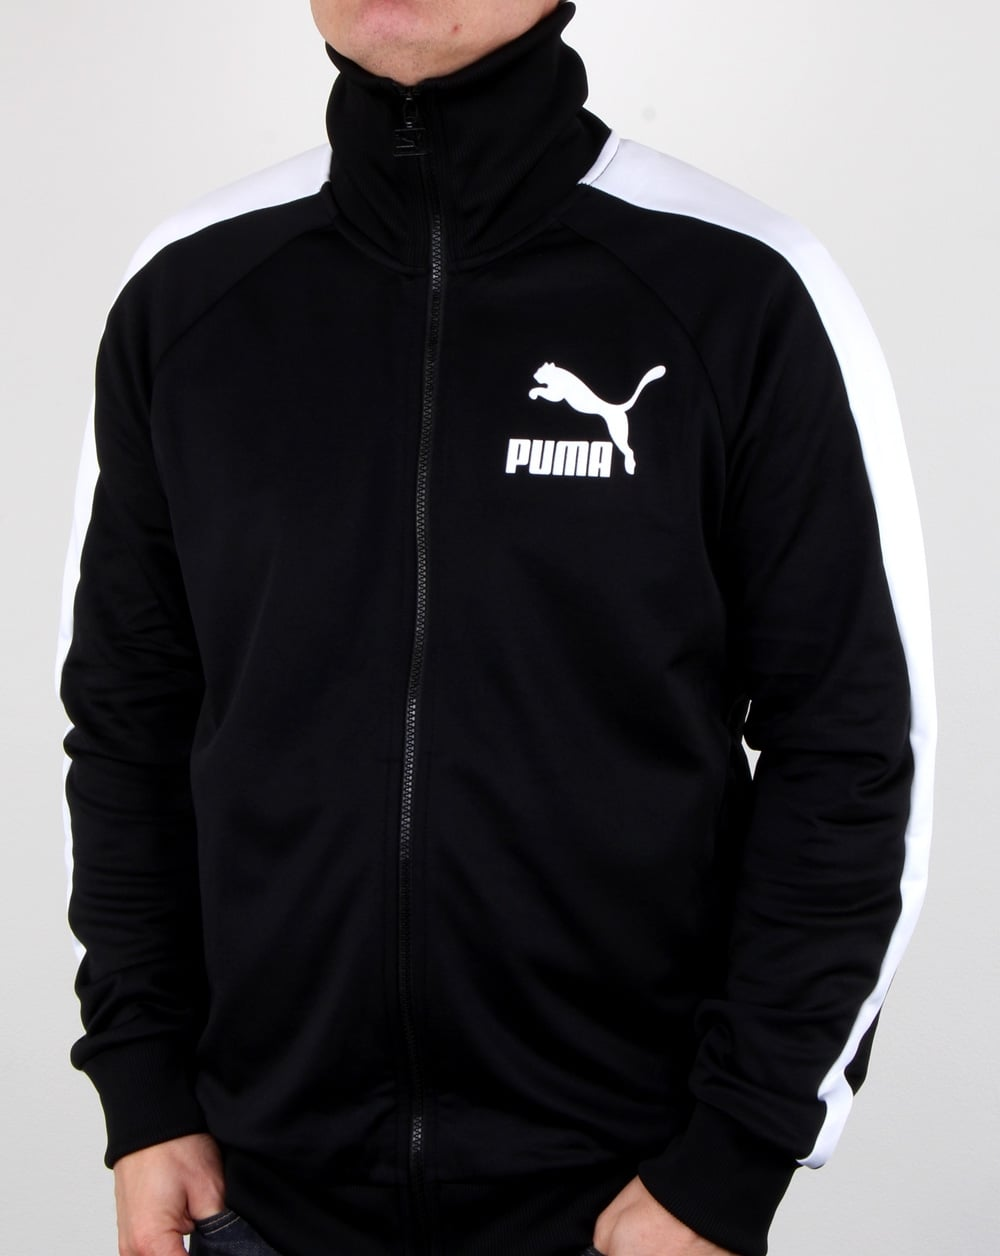 07e88d0f616e Puma Puma T7 Vintage Track Jacket Black white